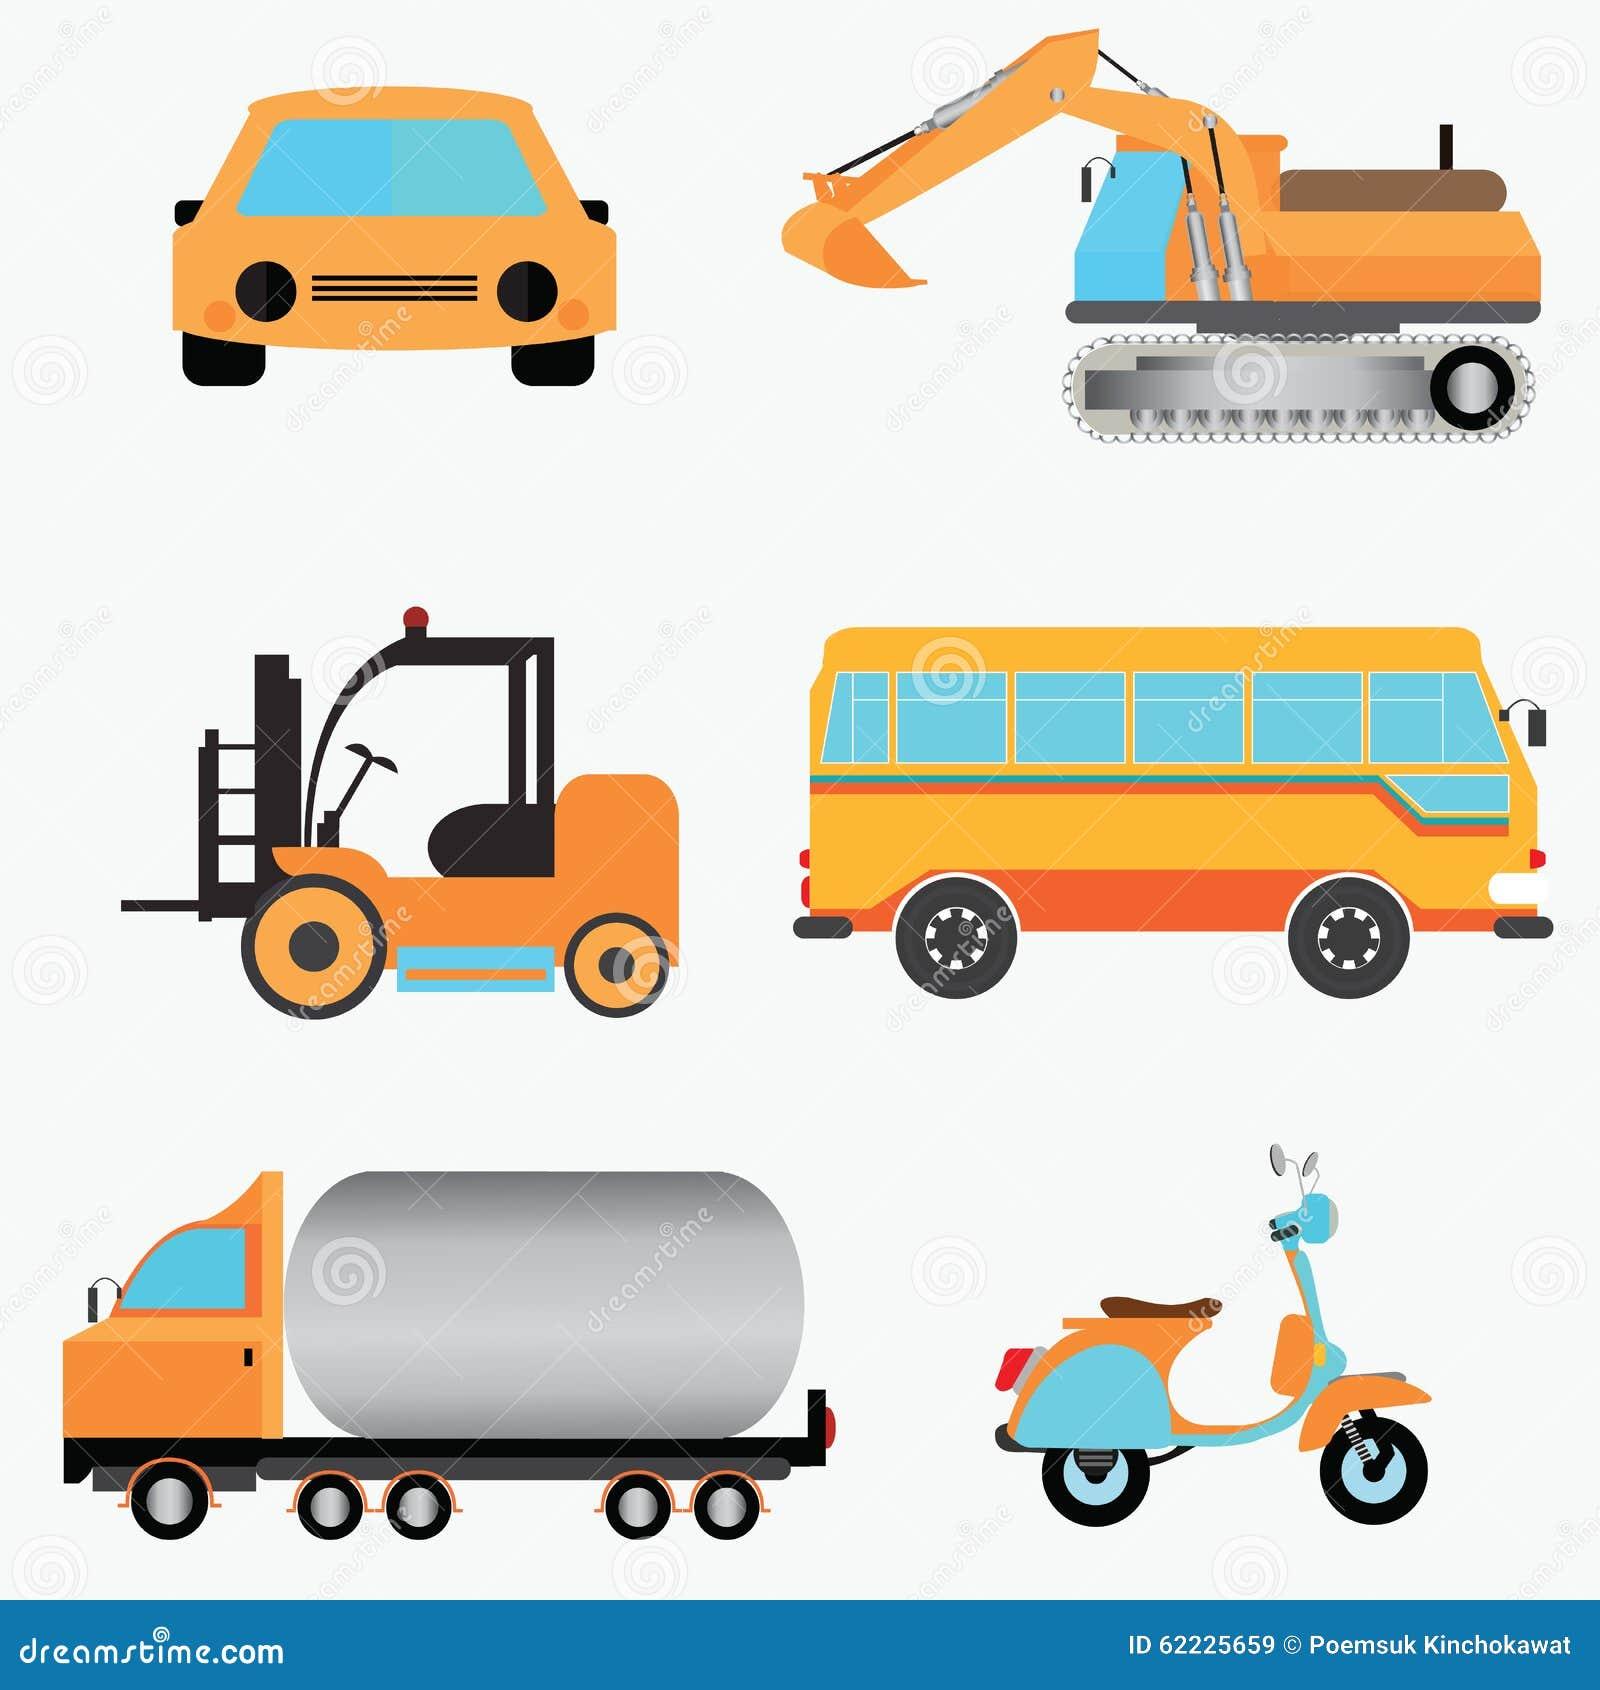 Lorry Transport Business Plan